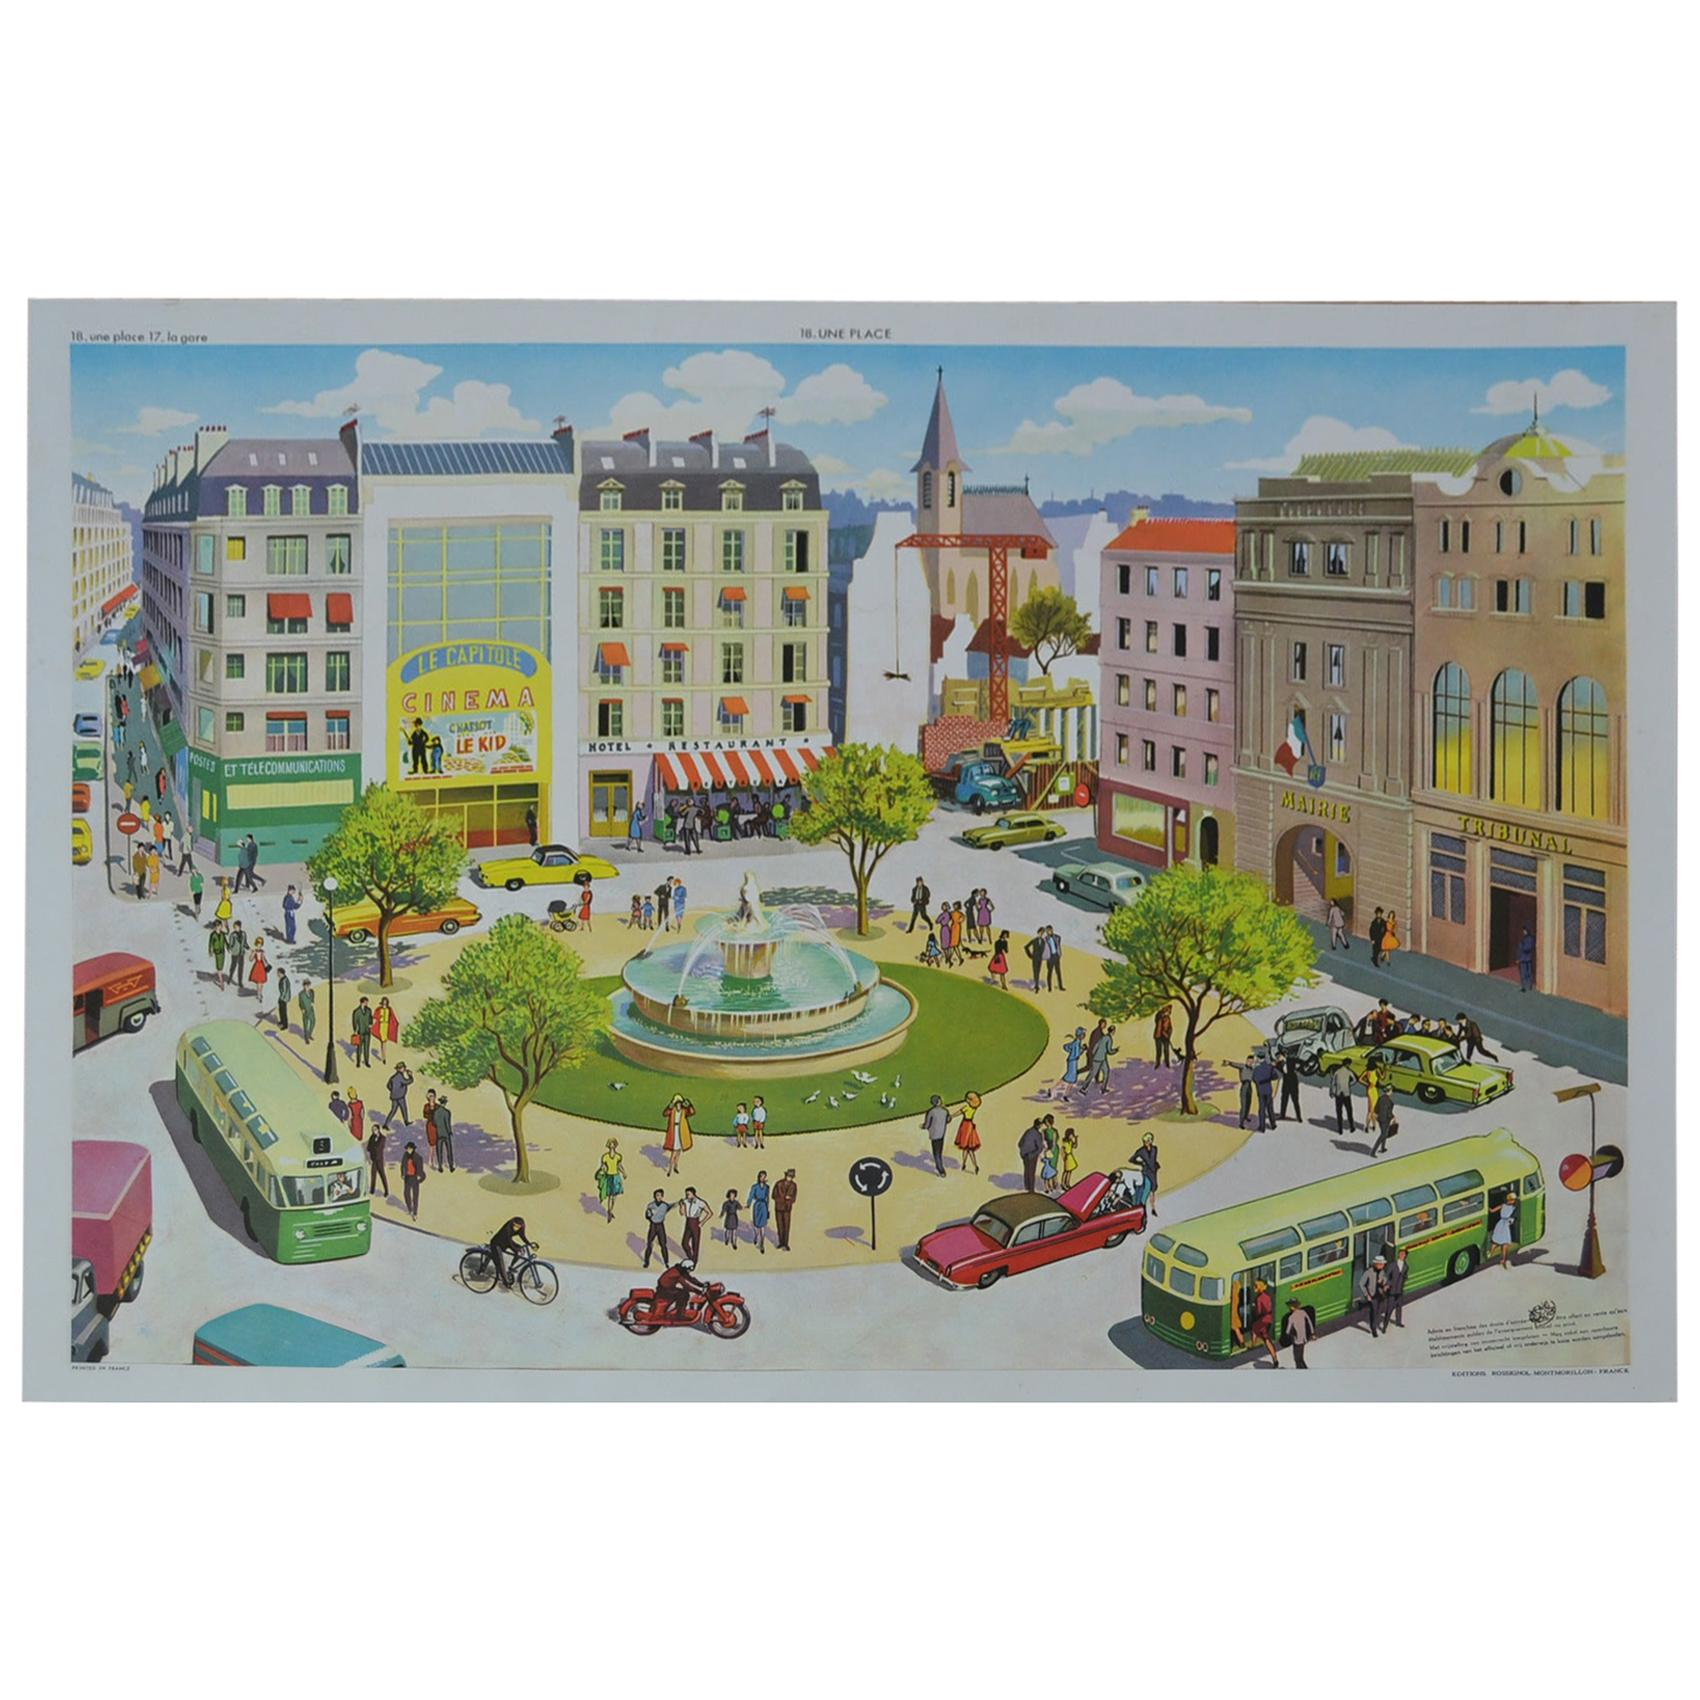 1950s School Chart, At the Square, Rossignol, Henri Mercier, France